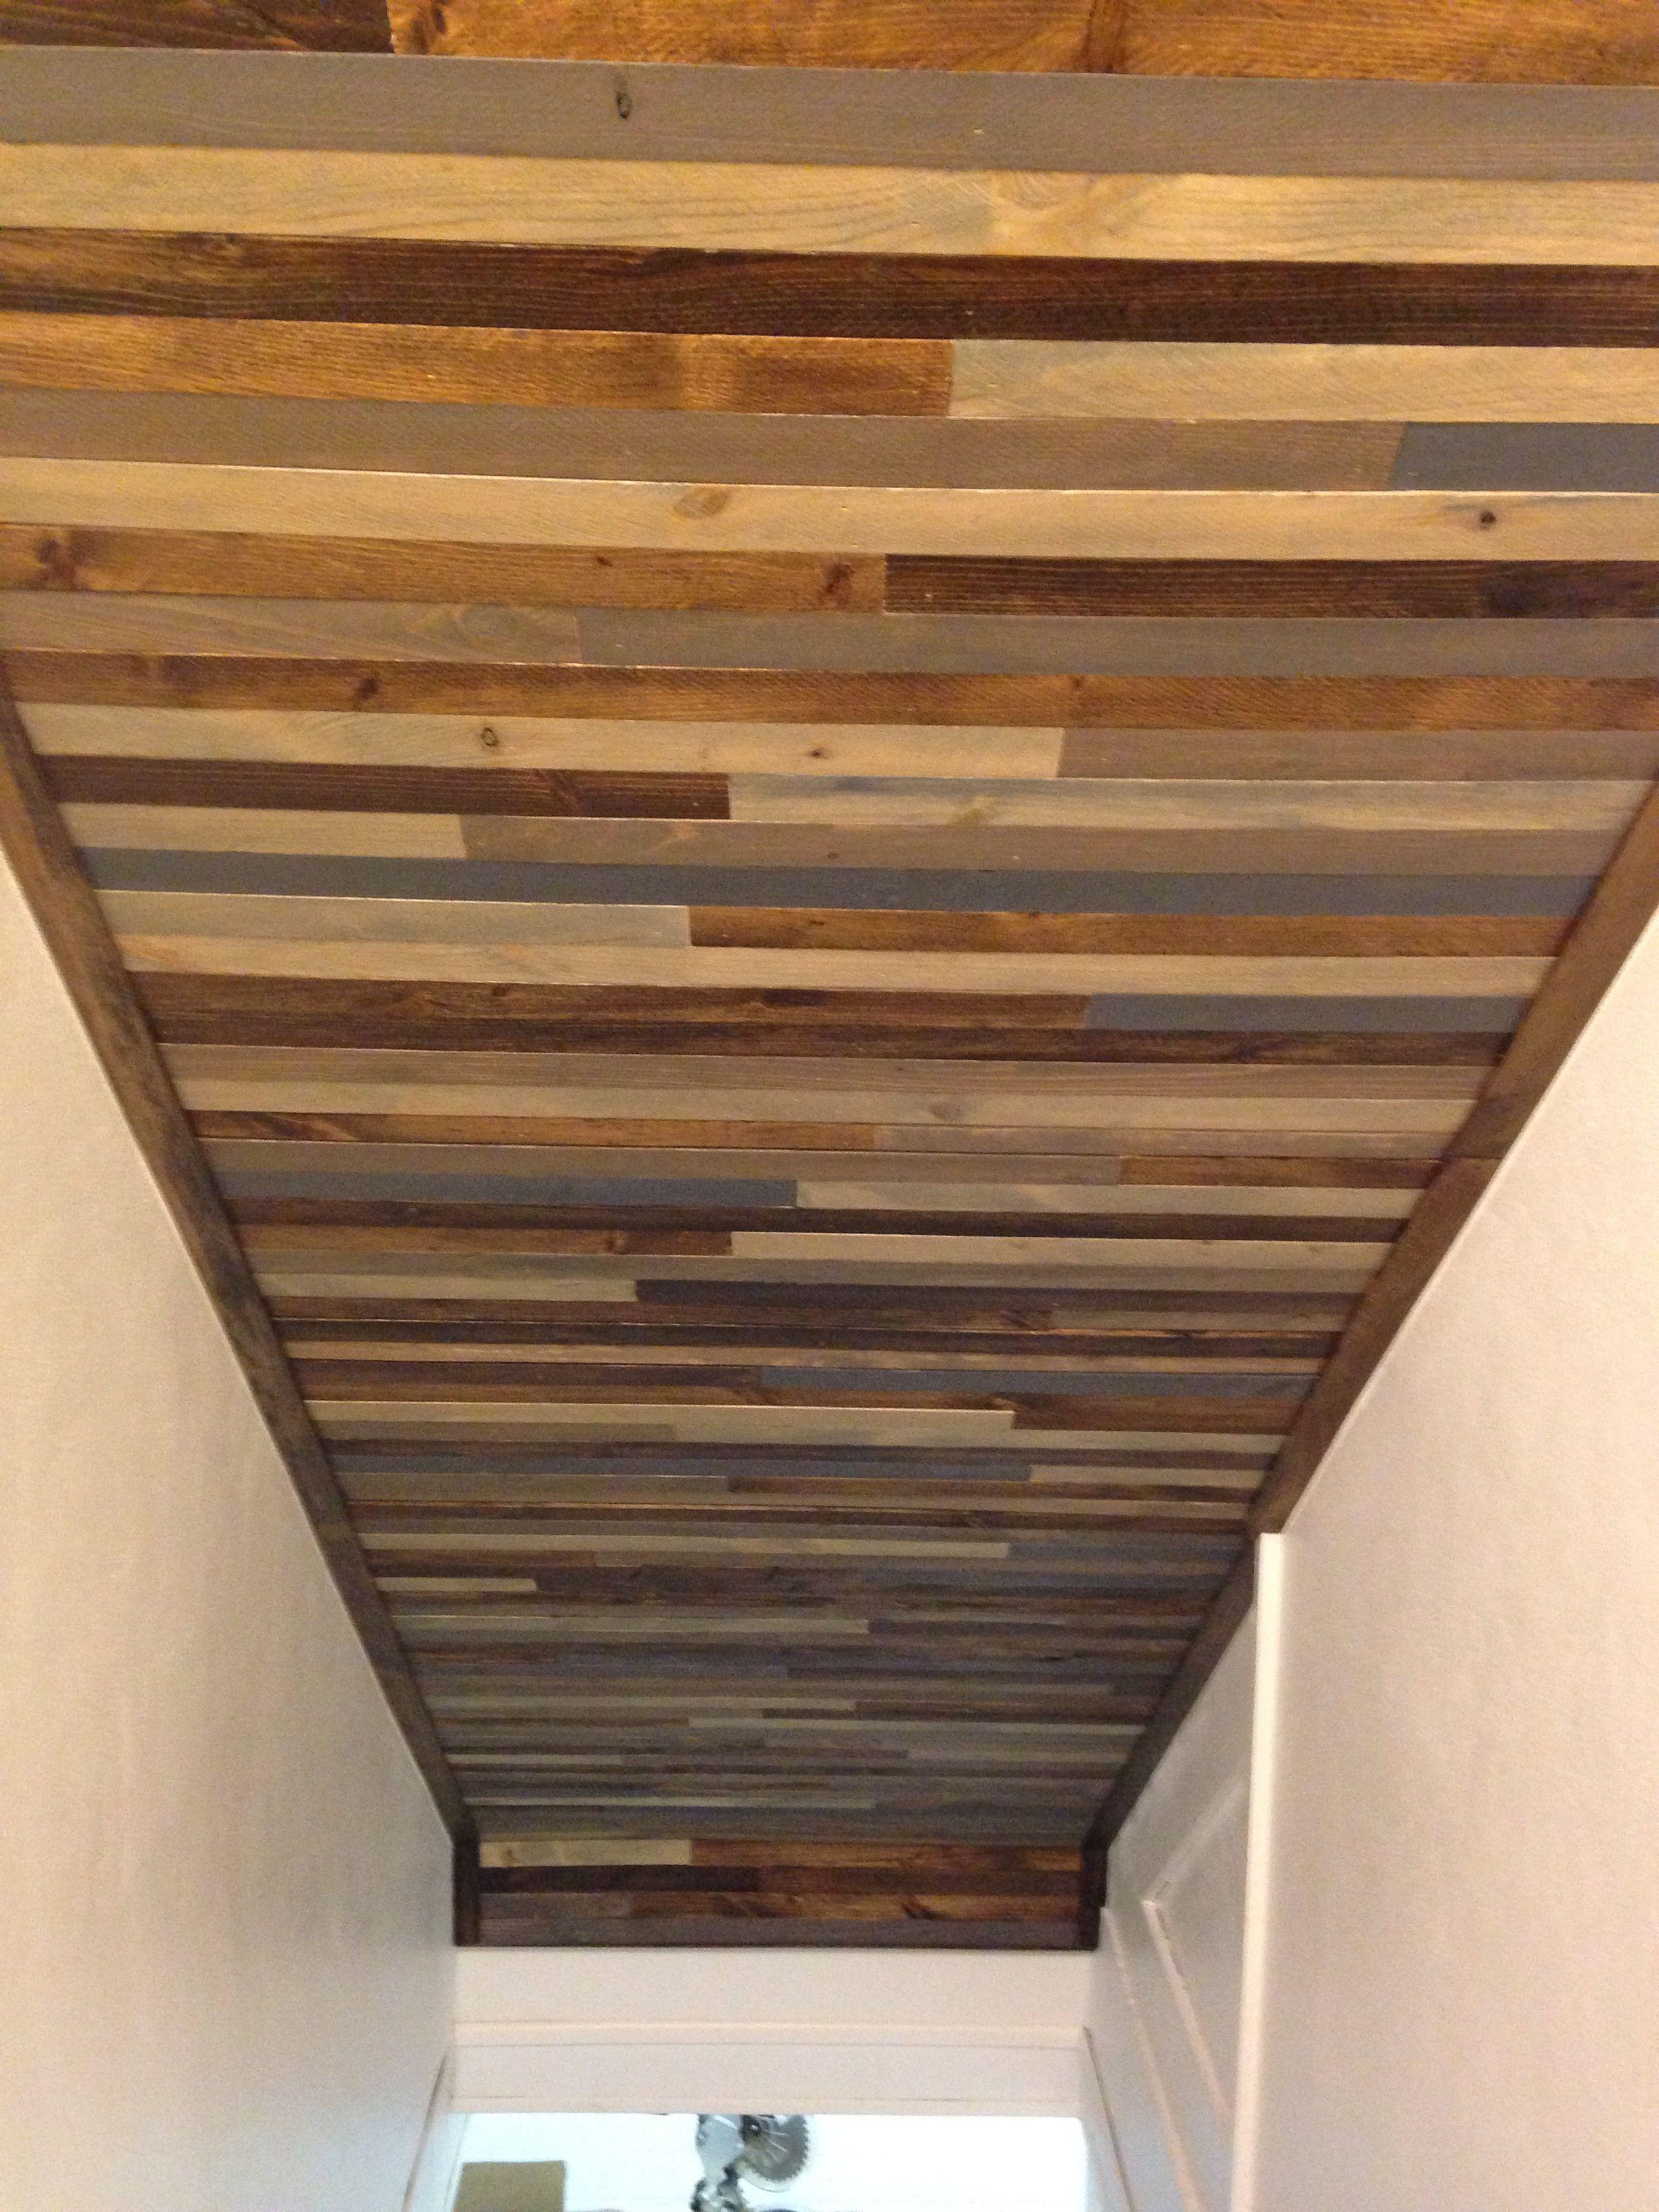 Plaster types in buildings: Plaster Ceilings Plaster